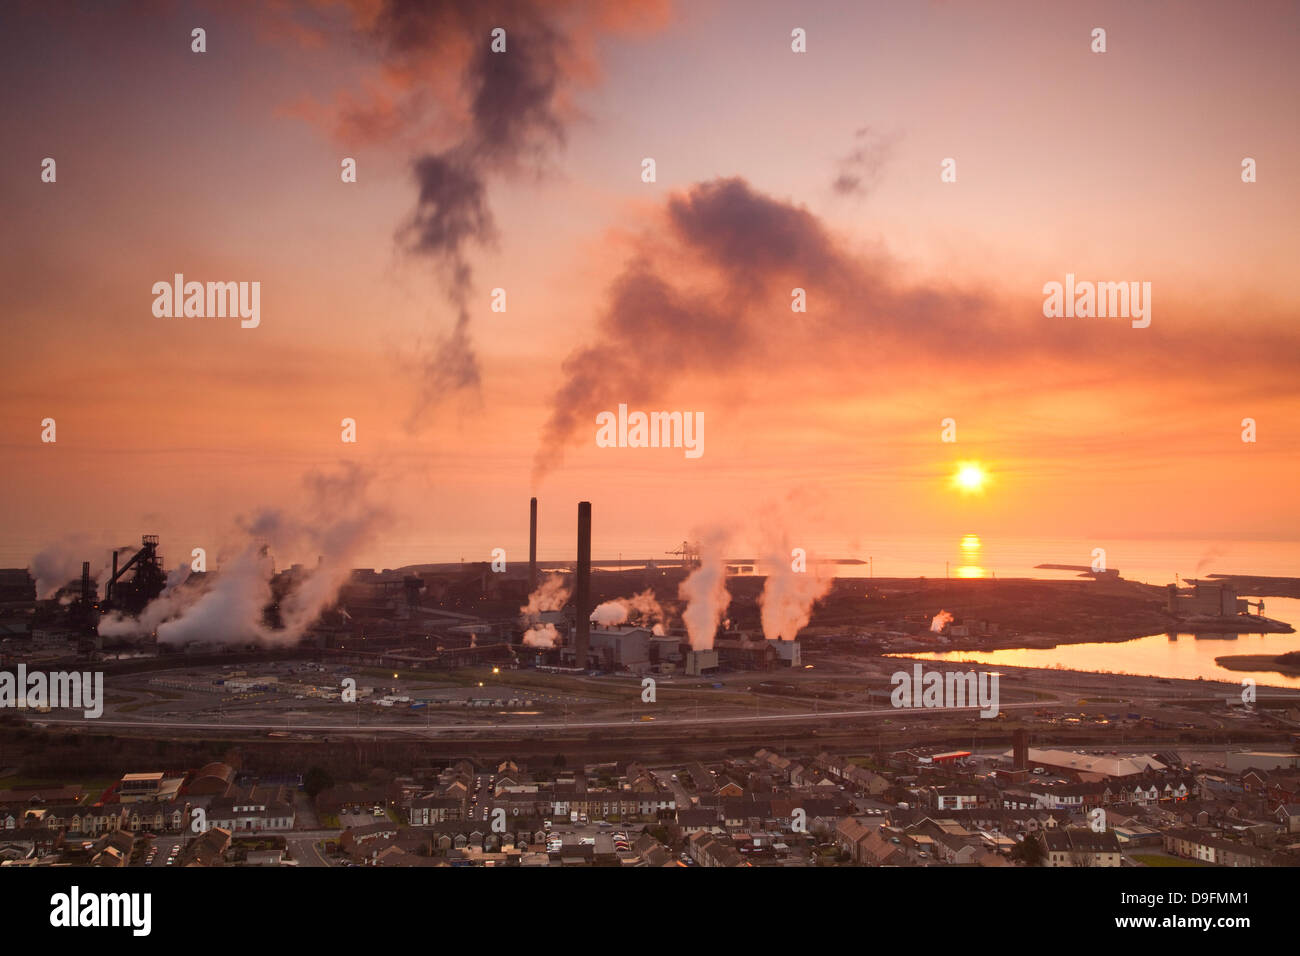 Blast furnaces, Corus Steelworks, Port Talbot, Glamorgan, Wales, UK - Stock Image